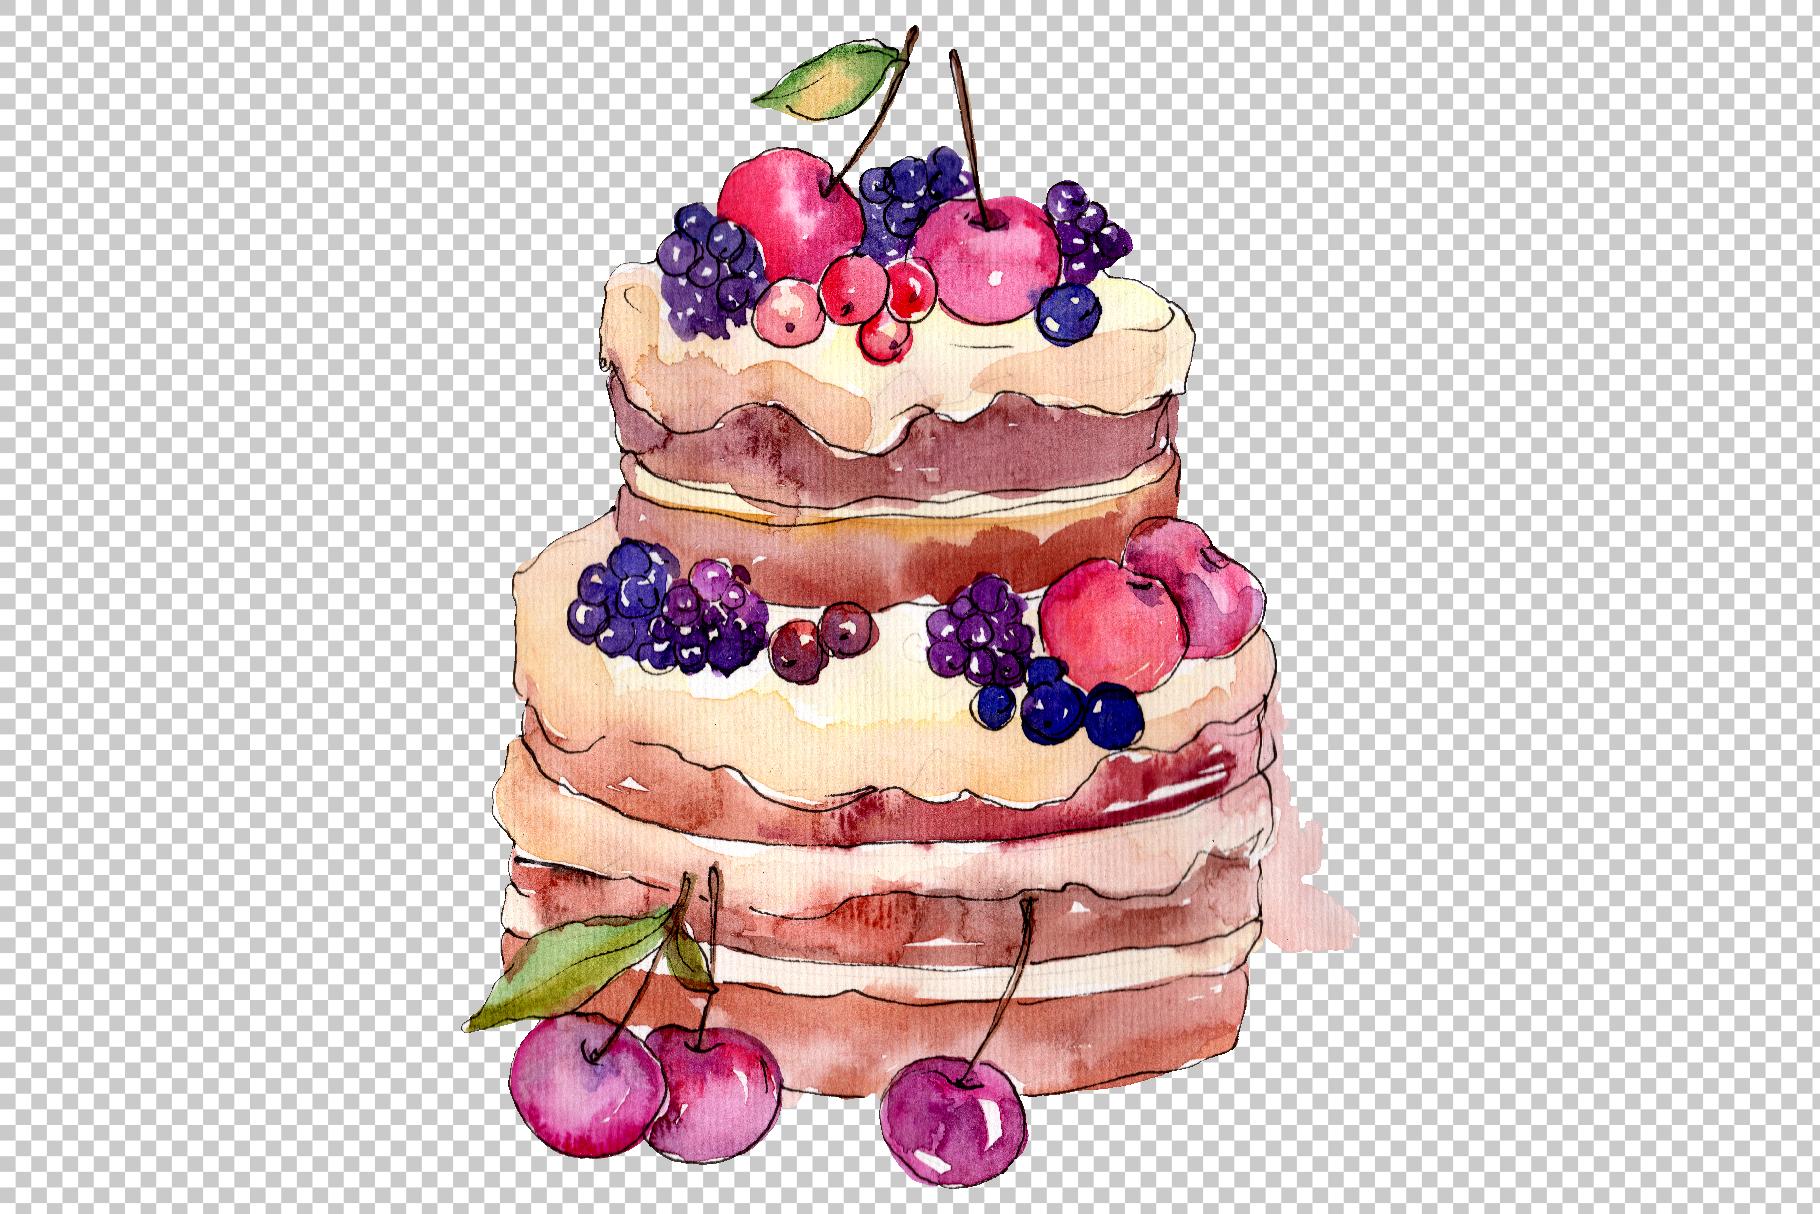 Dessert michel Watercolor png example image 5